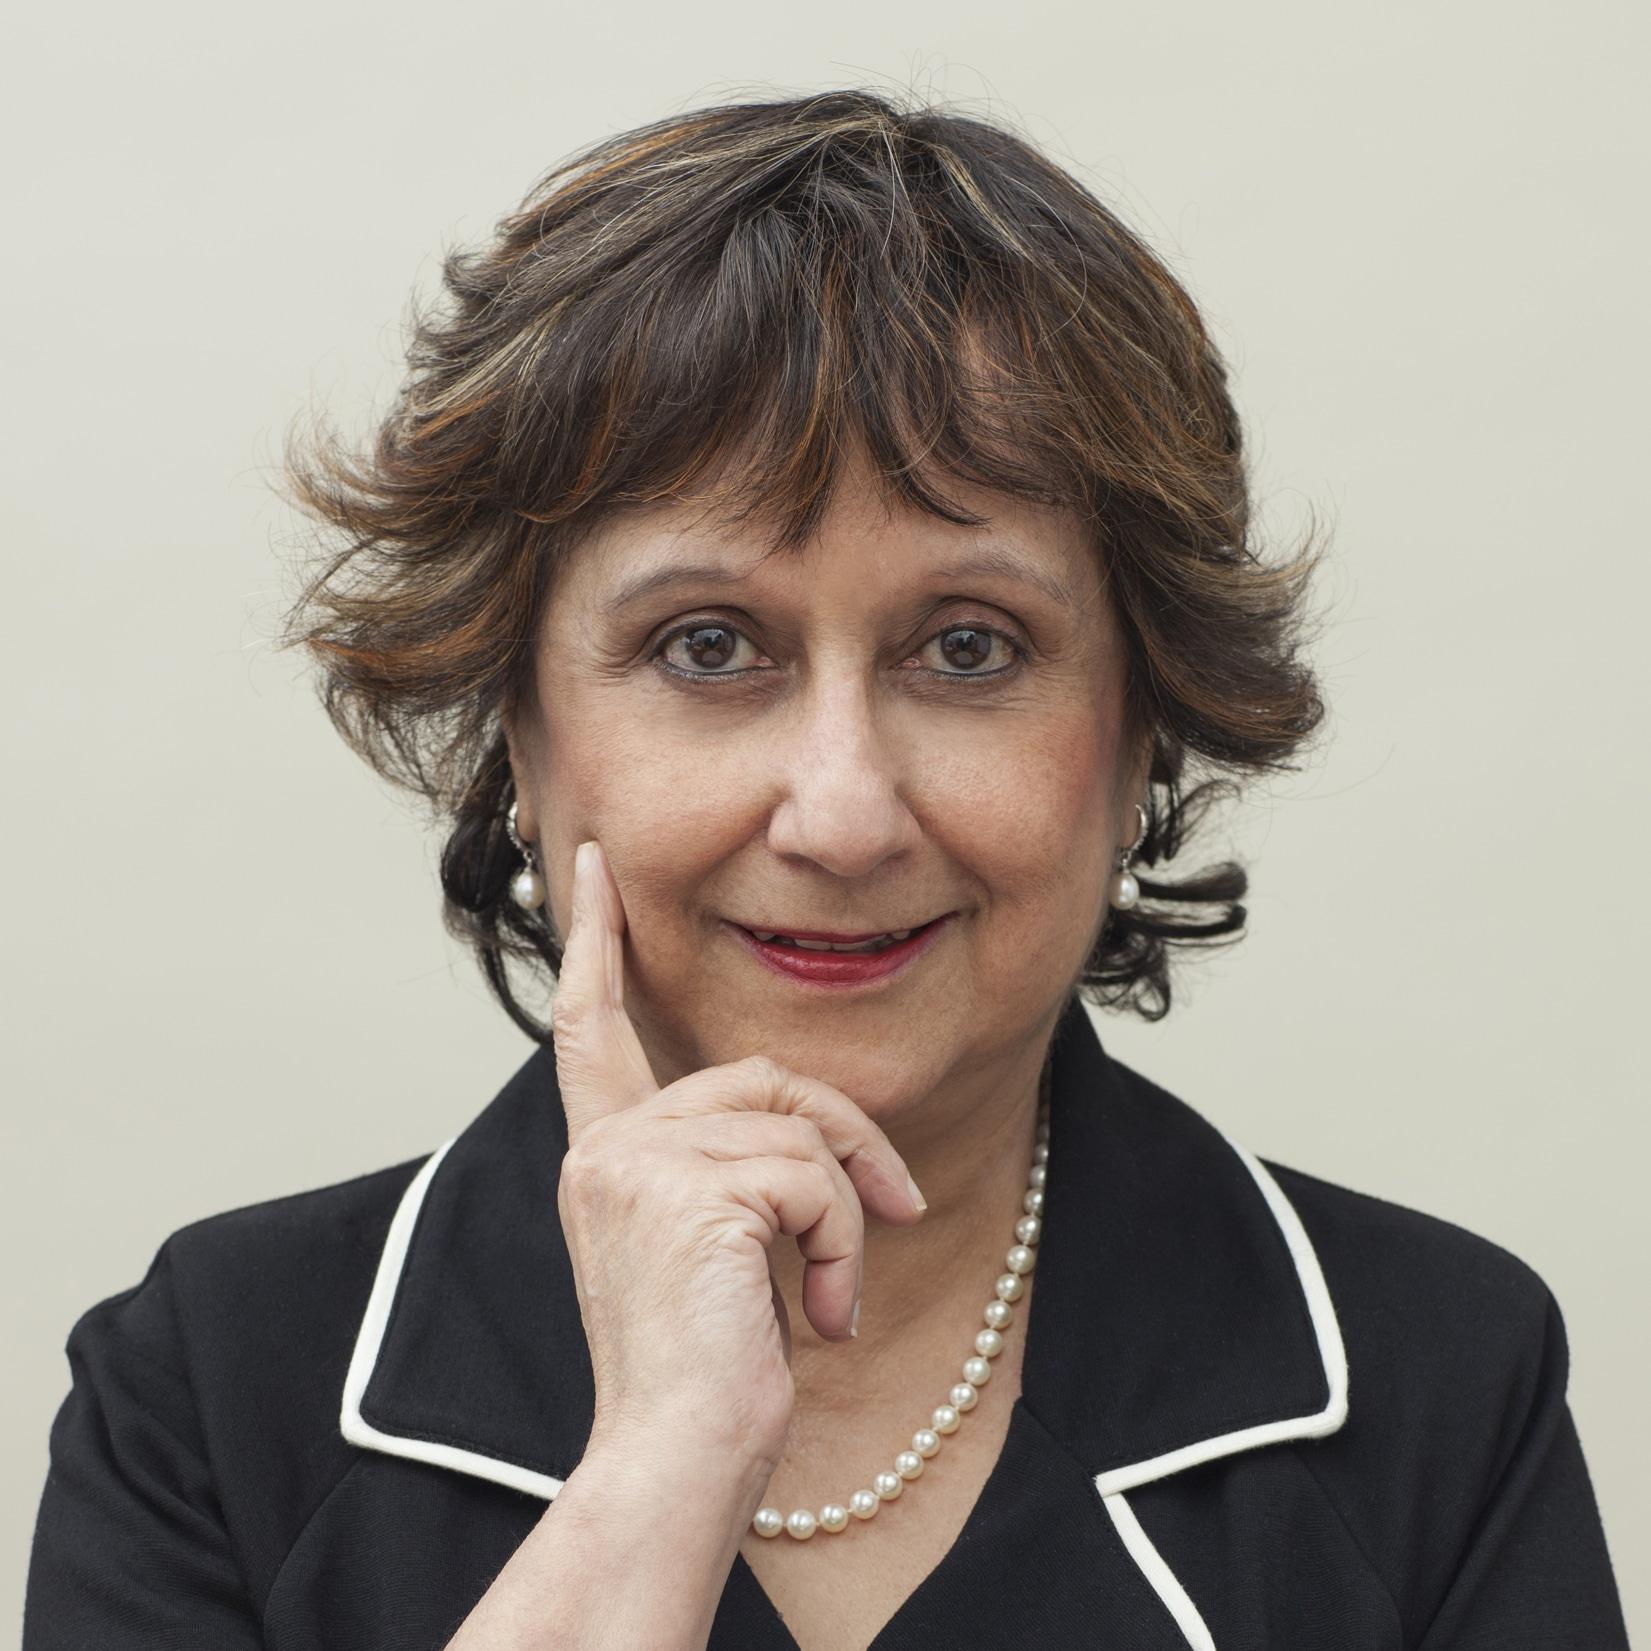 Yasmin-Alibhai-Brown-multiculturalism-equality-diversity-speaker-presenter-TV-broadcaster-writer-at-Great-British-Speakers